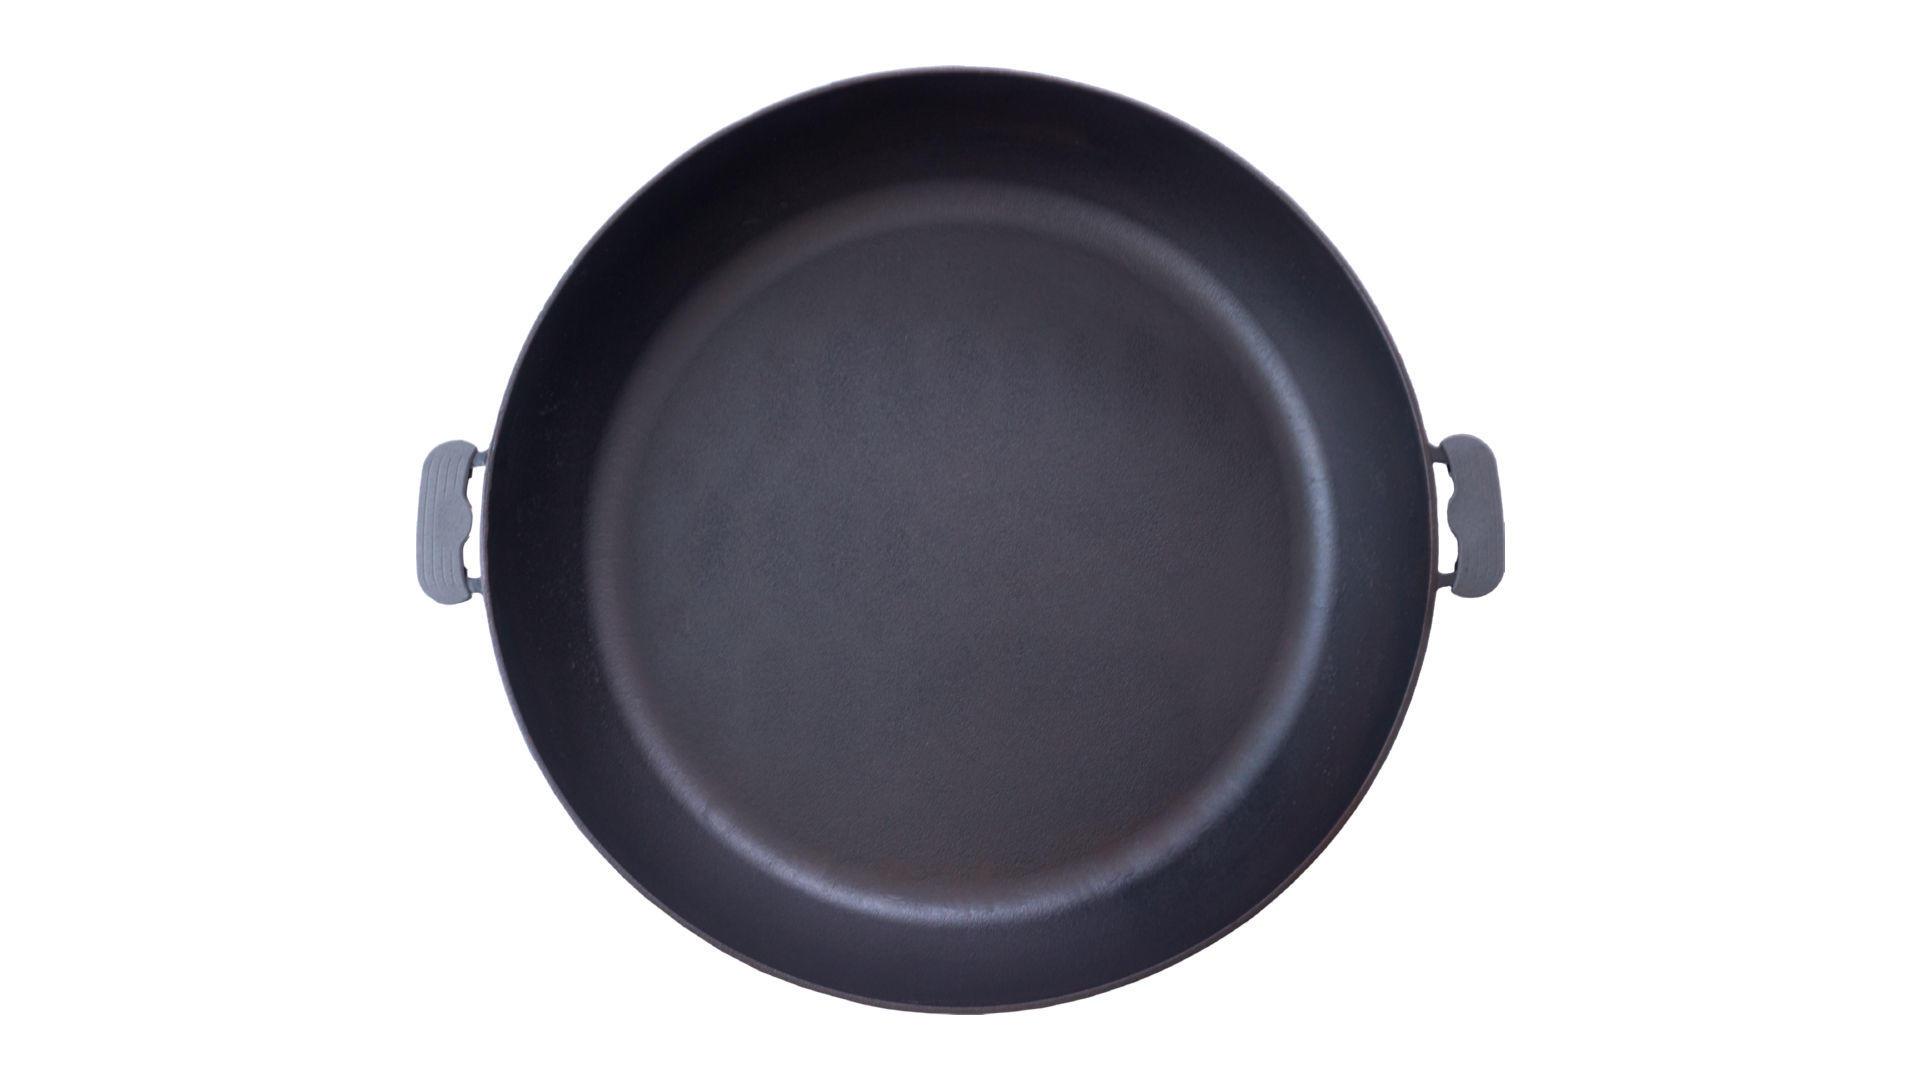 Сковорода жаровня чугунная Biol - 500 мм 5